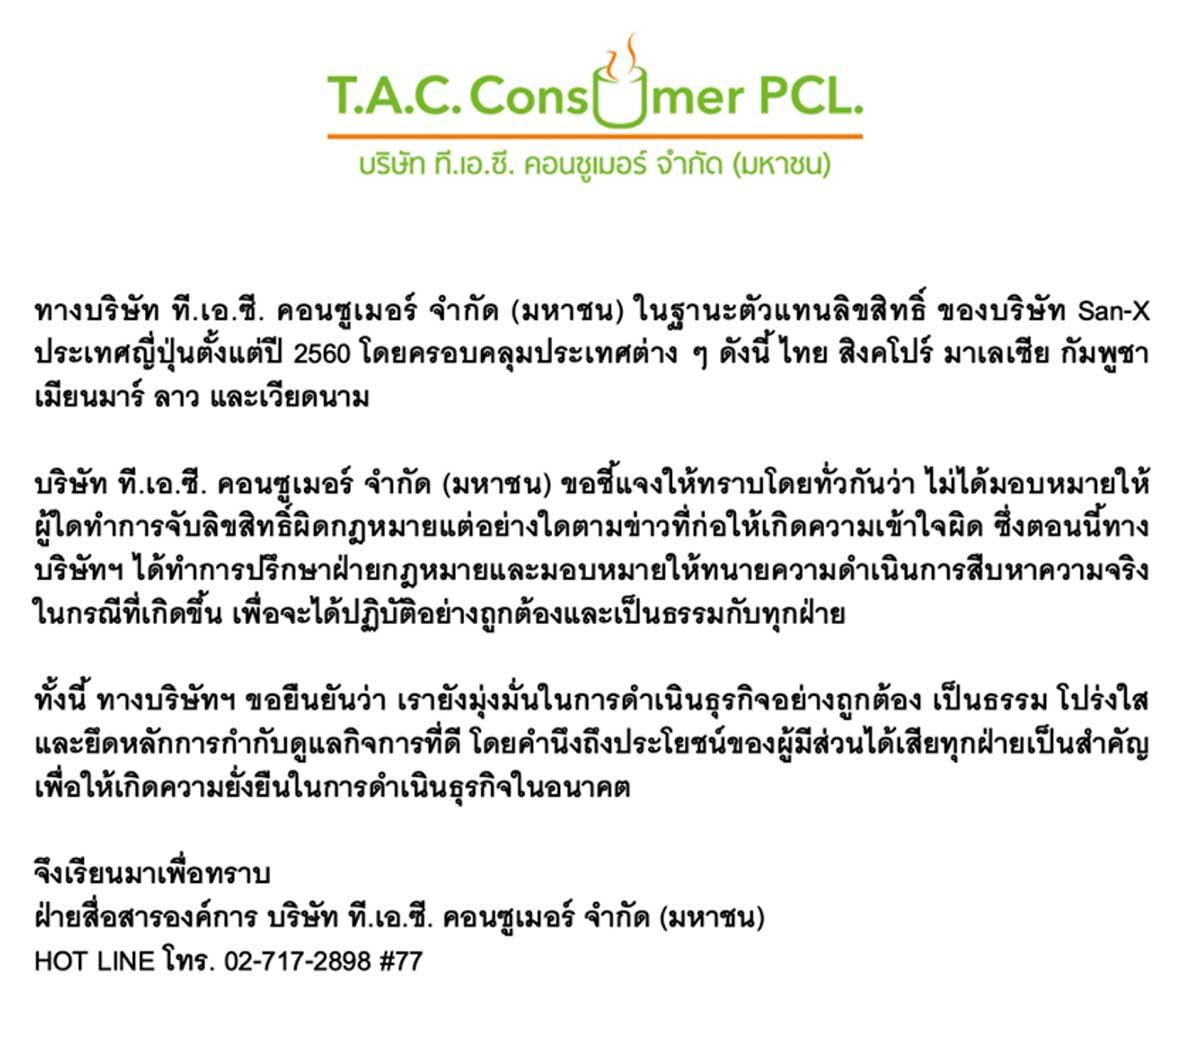 tac consumer announce